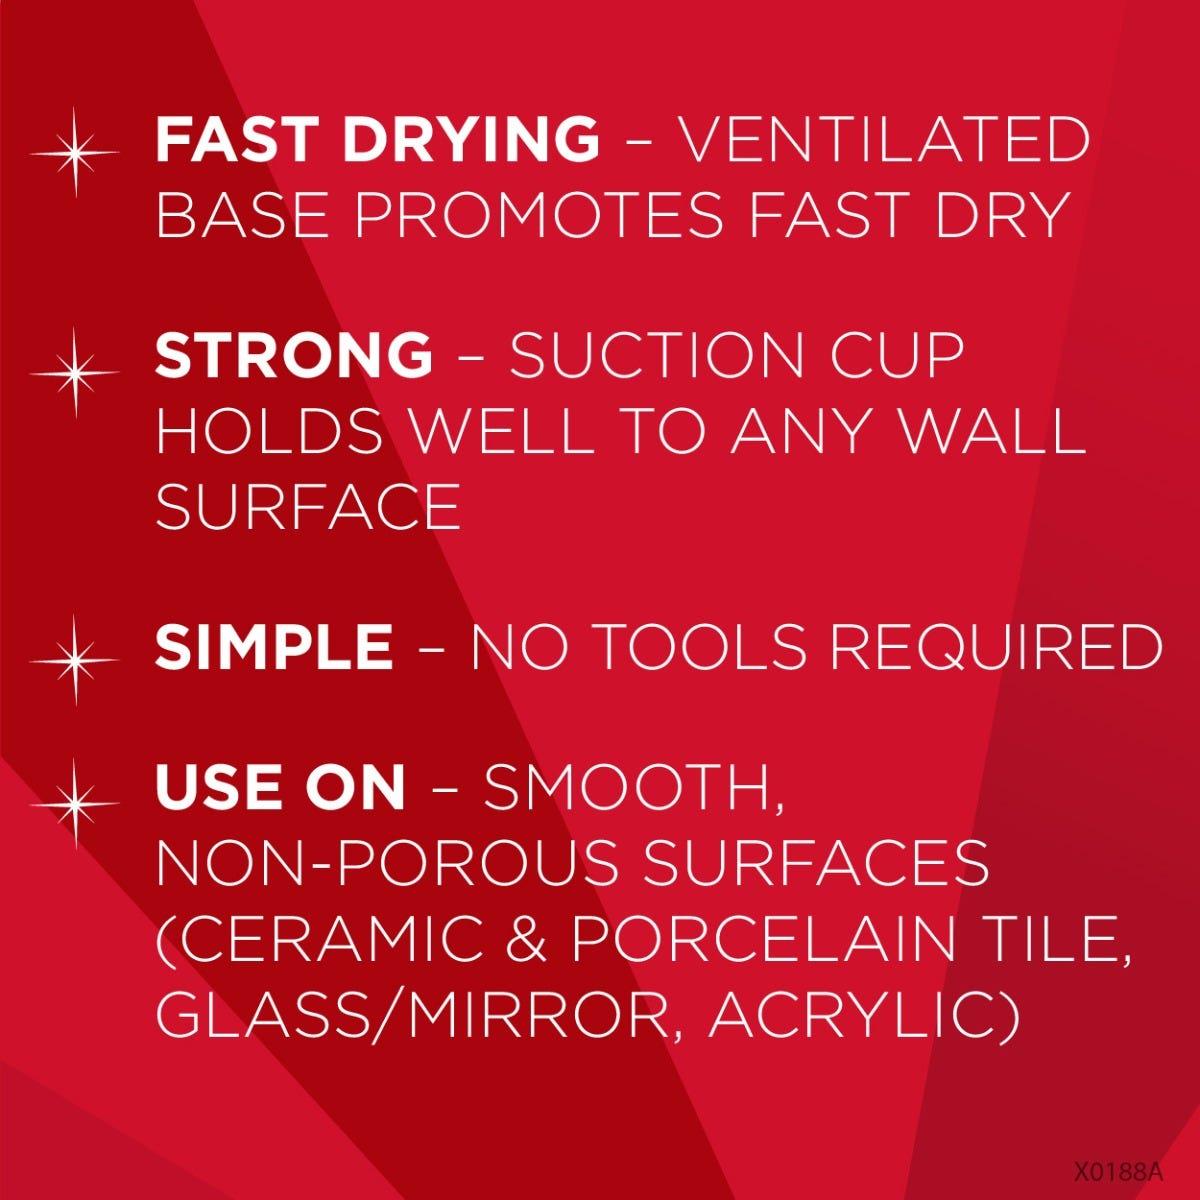 https://googone.com/media/catalog/product/s/u/suction_soap_tray_benefits.jpg